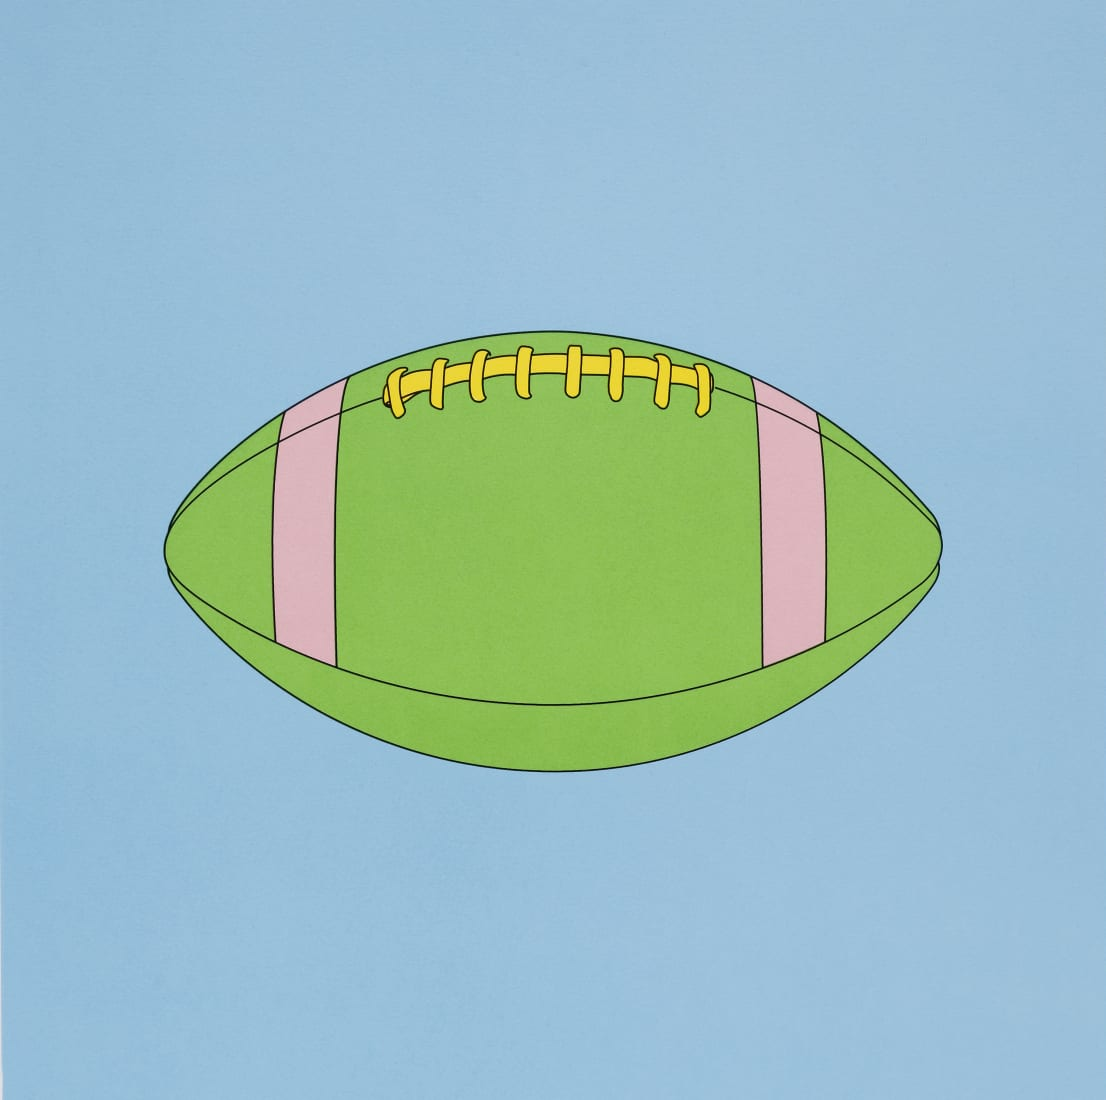 "<span class=""artist""><strong>Michael Craig-Martin</strong></span>, <span class=""title""><em>American football</em>, 2019</span>"